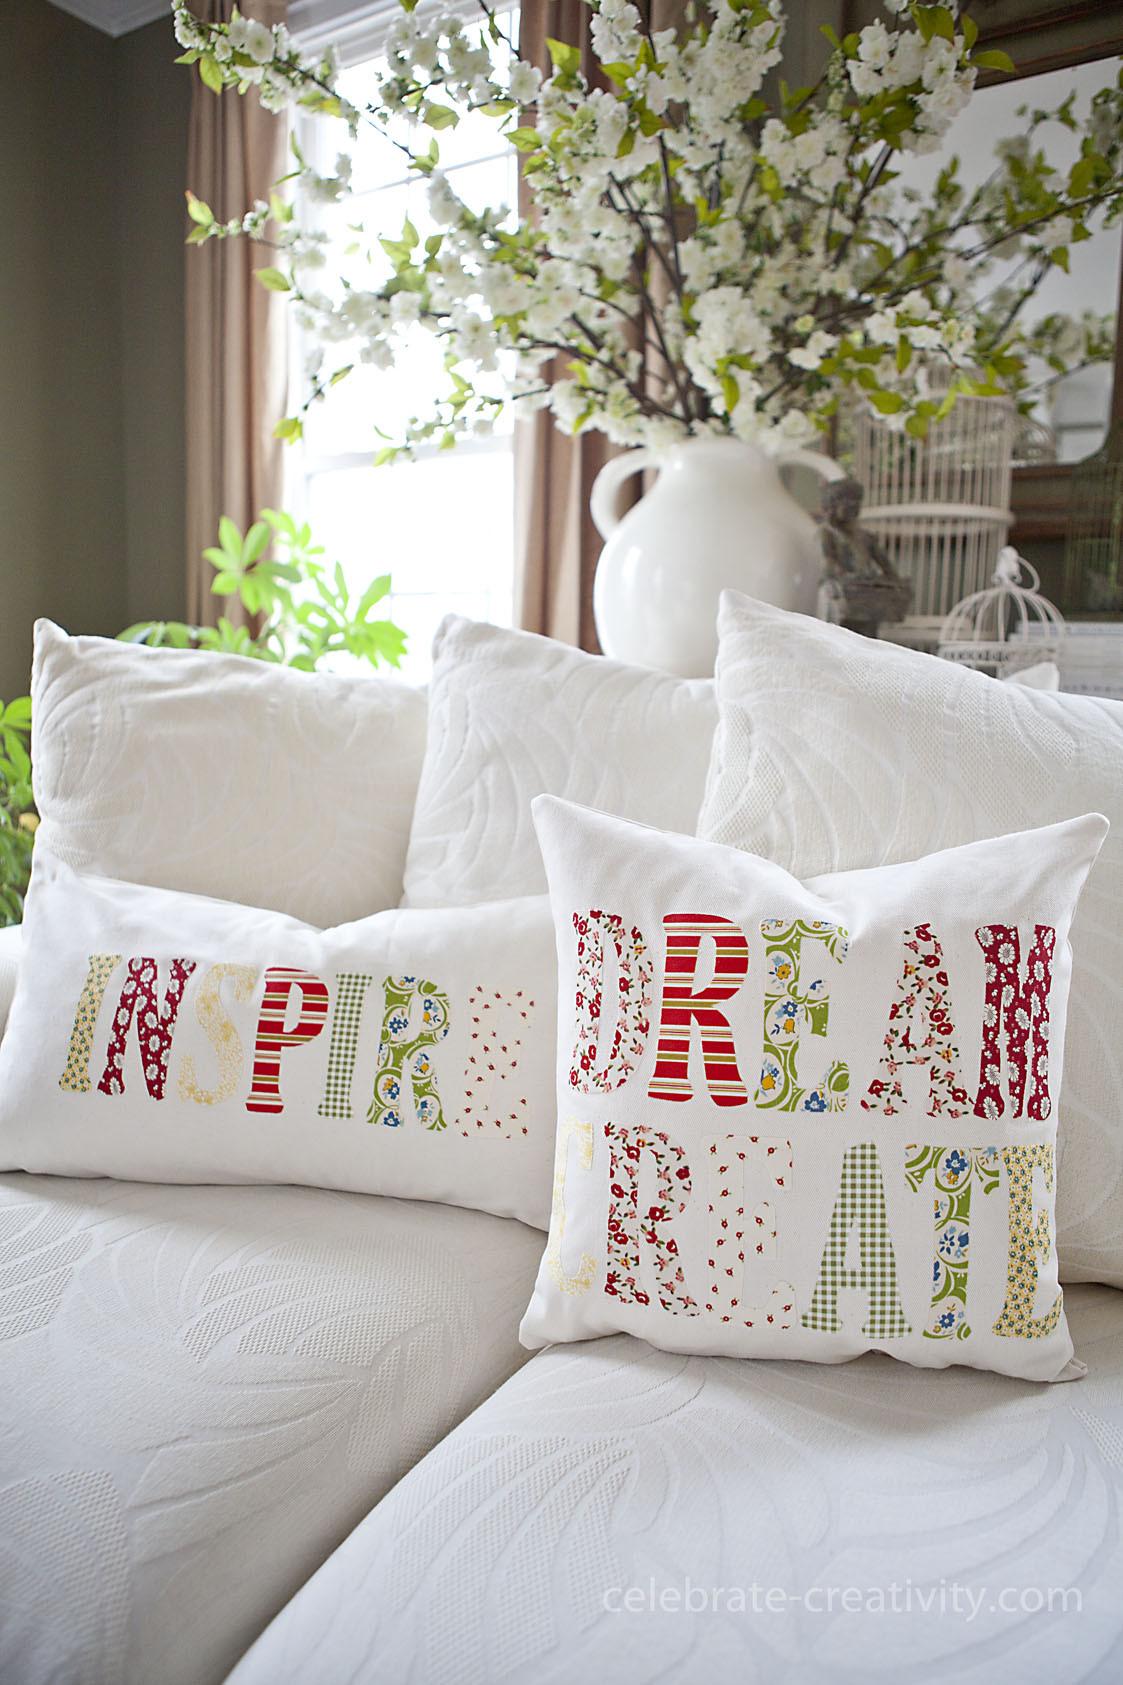 Best ideas about DIY Throw Pillows . Save or Pin DIY Inspiration Throw Pillows Now.